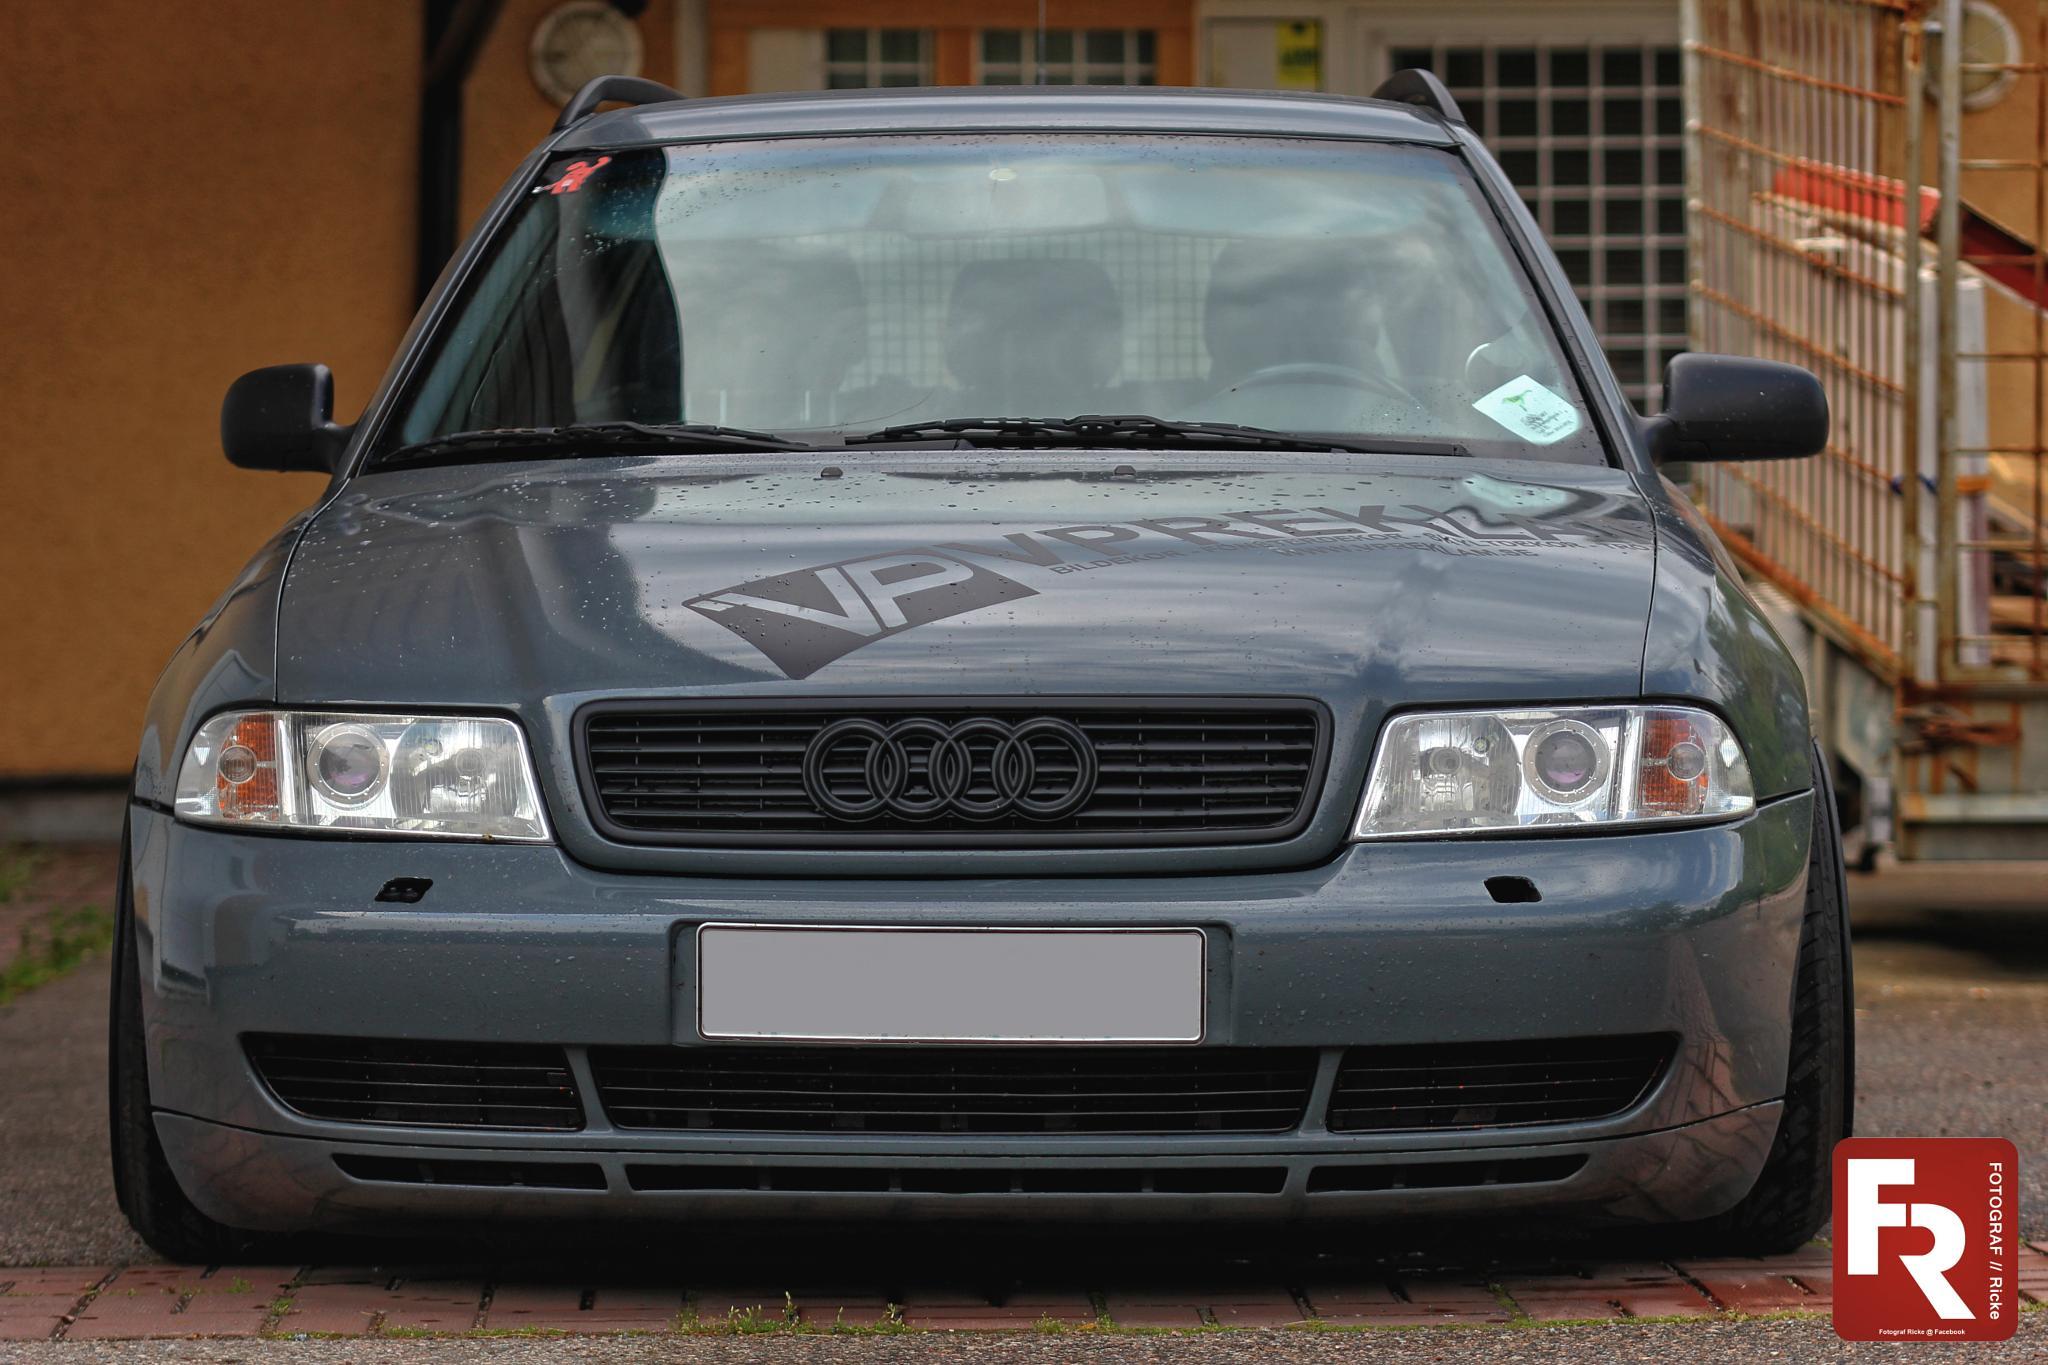 Audi A4 B5 Avant by mingan77